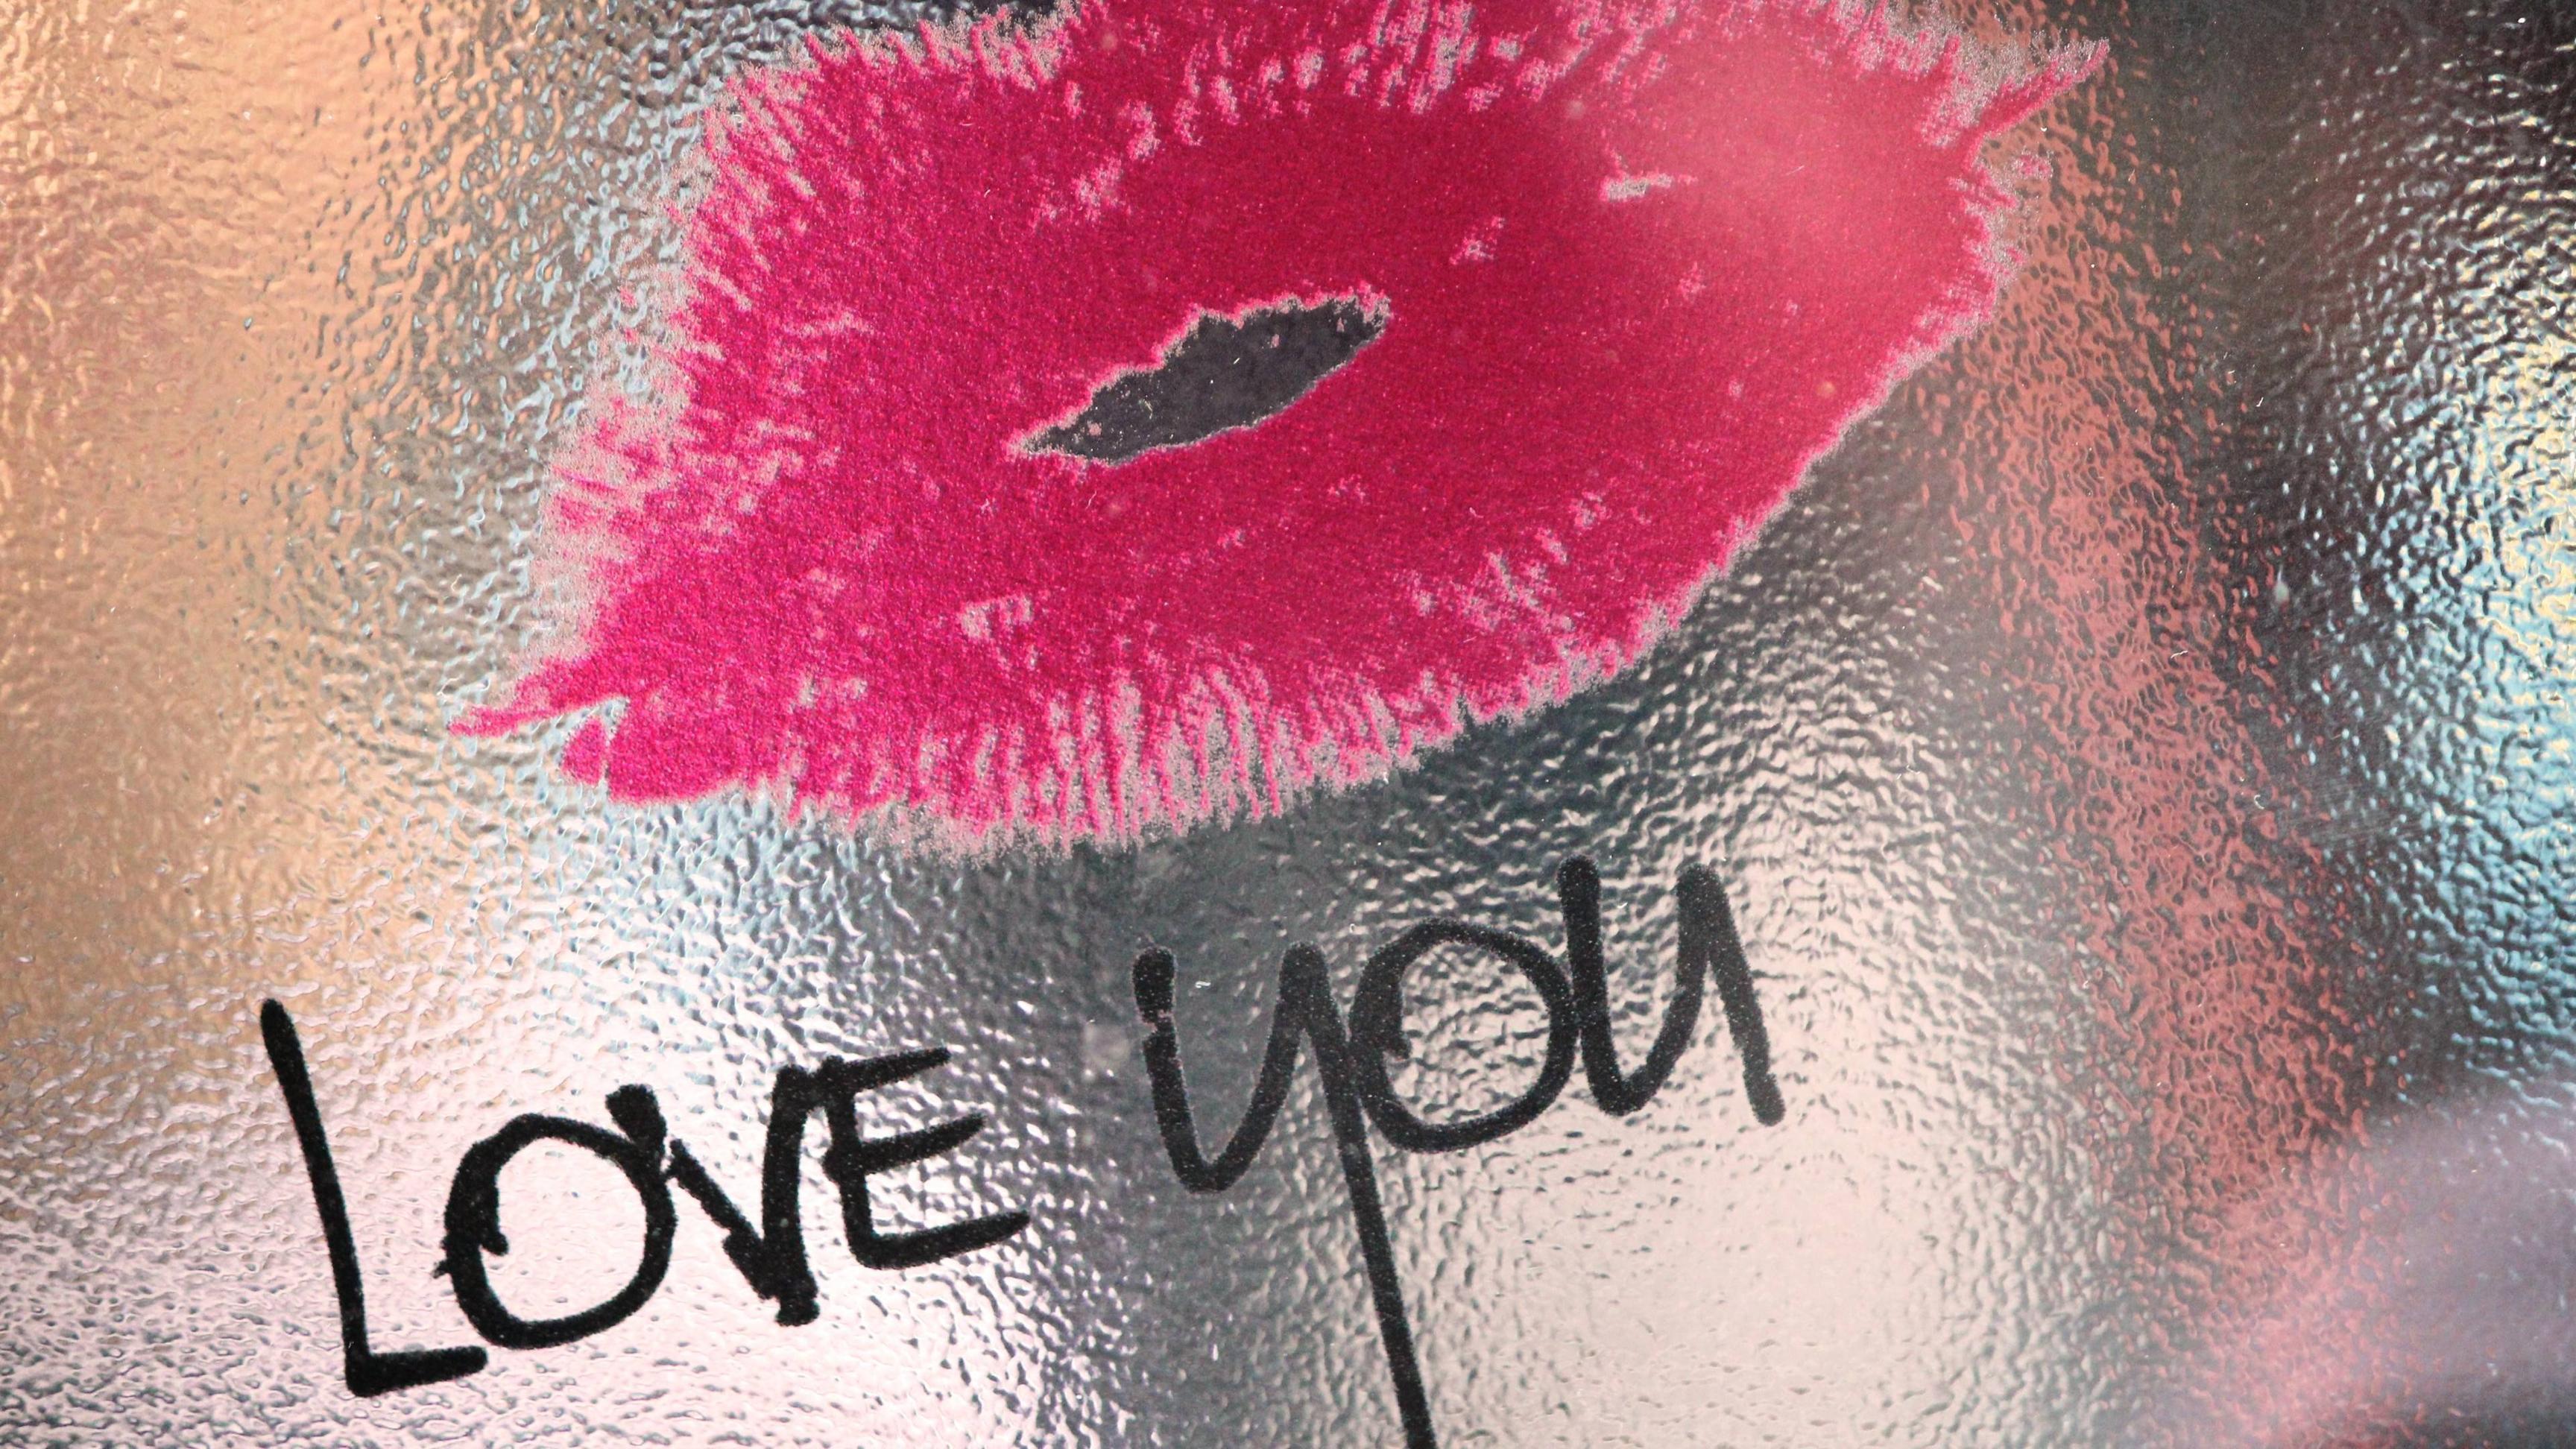 Kissing Wallpapers HD 3456x1944